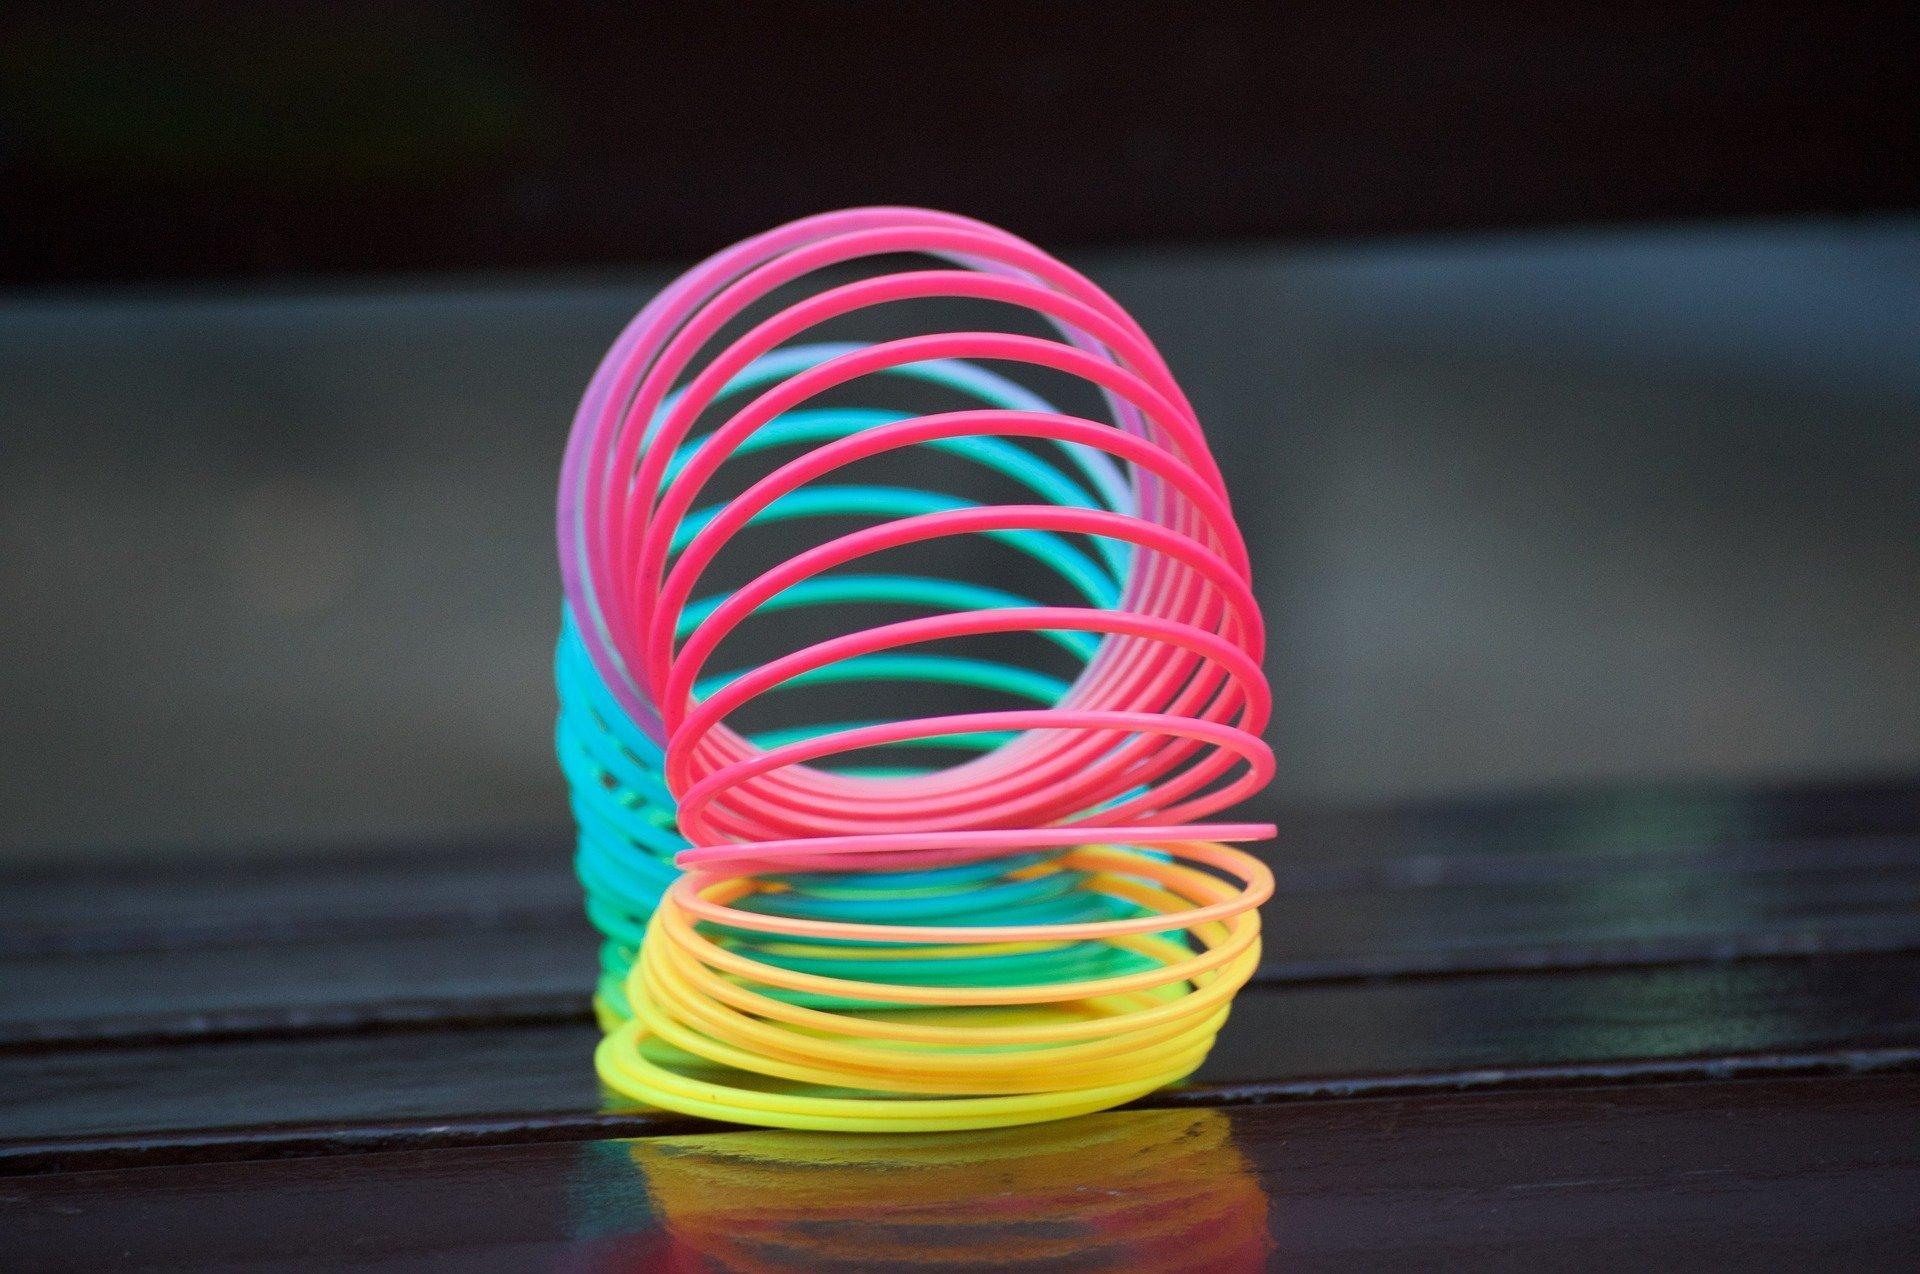 Le jouet à ressort Slinky